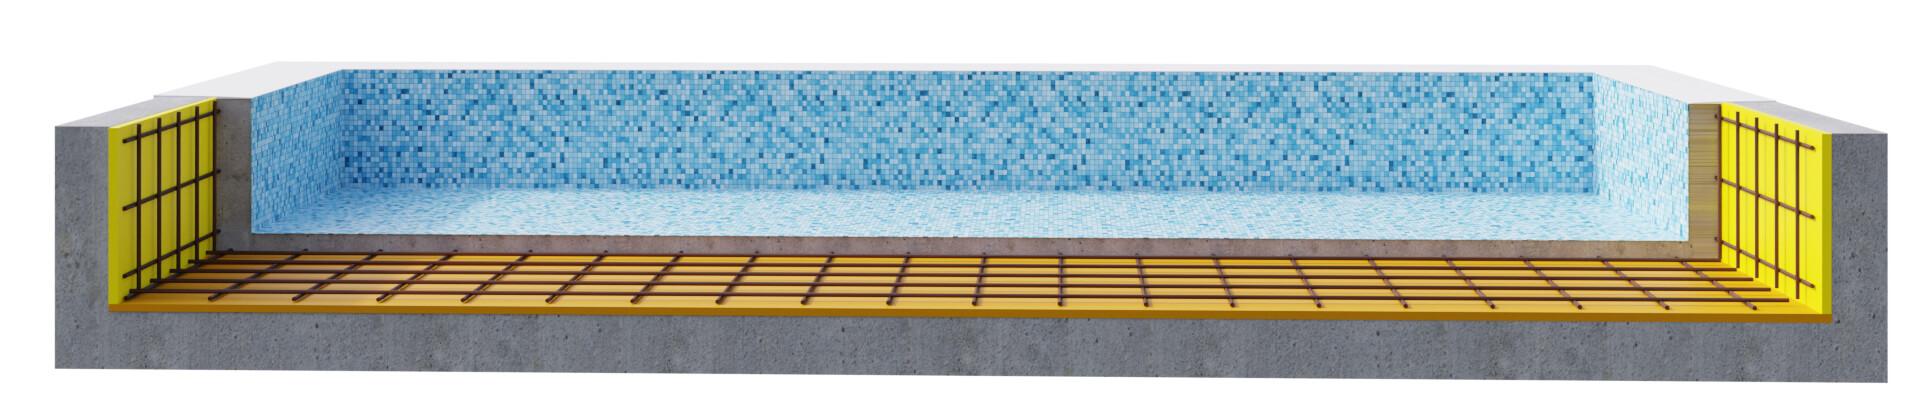 rooftop-pool-insulation-5.jpg